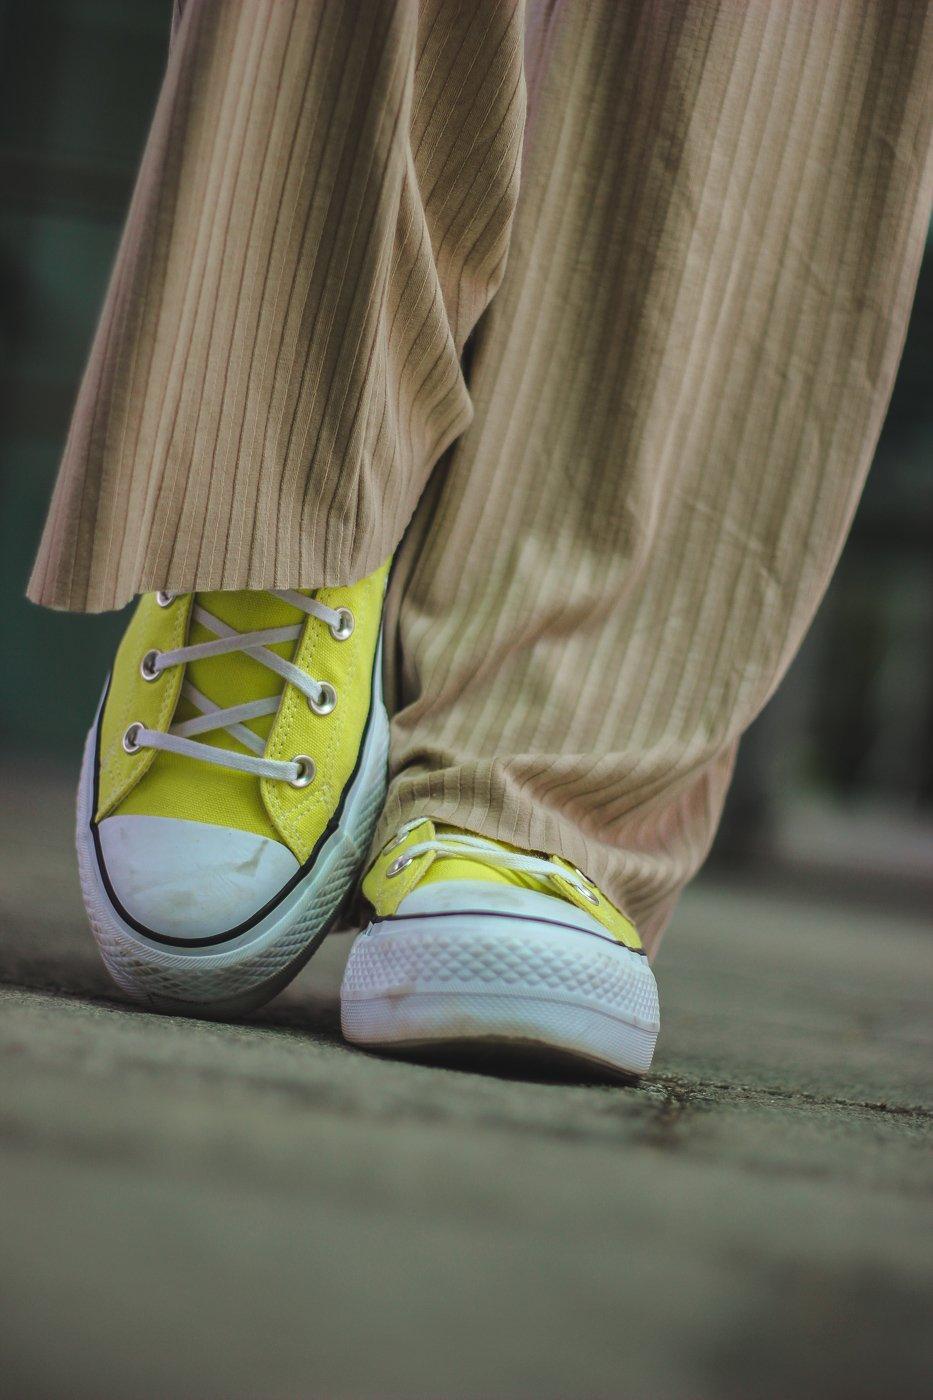 conny doll lifestyle: Details, Converse, Chucks in gelb, sportlicher Style